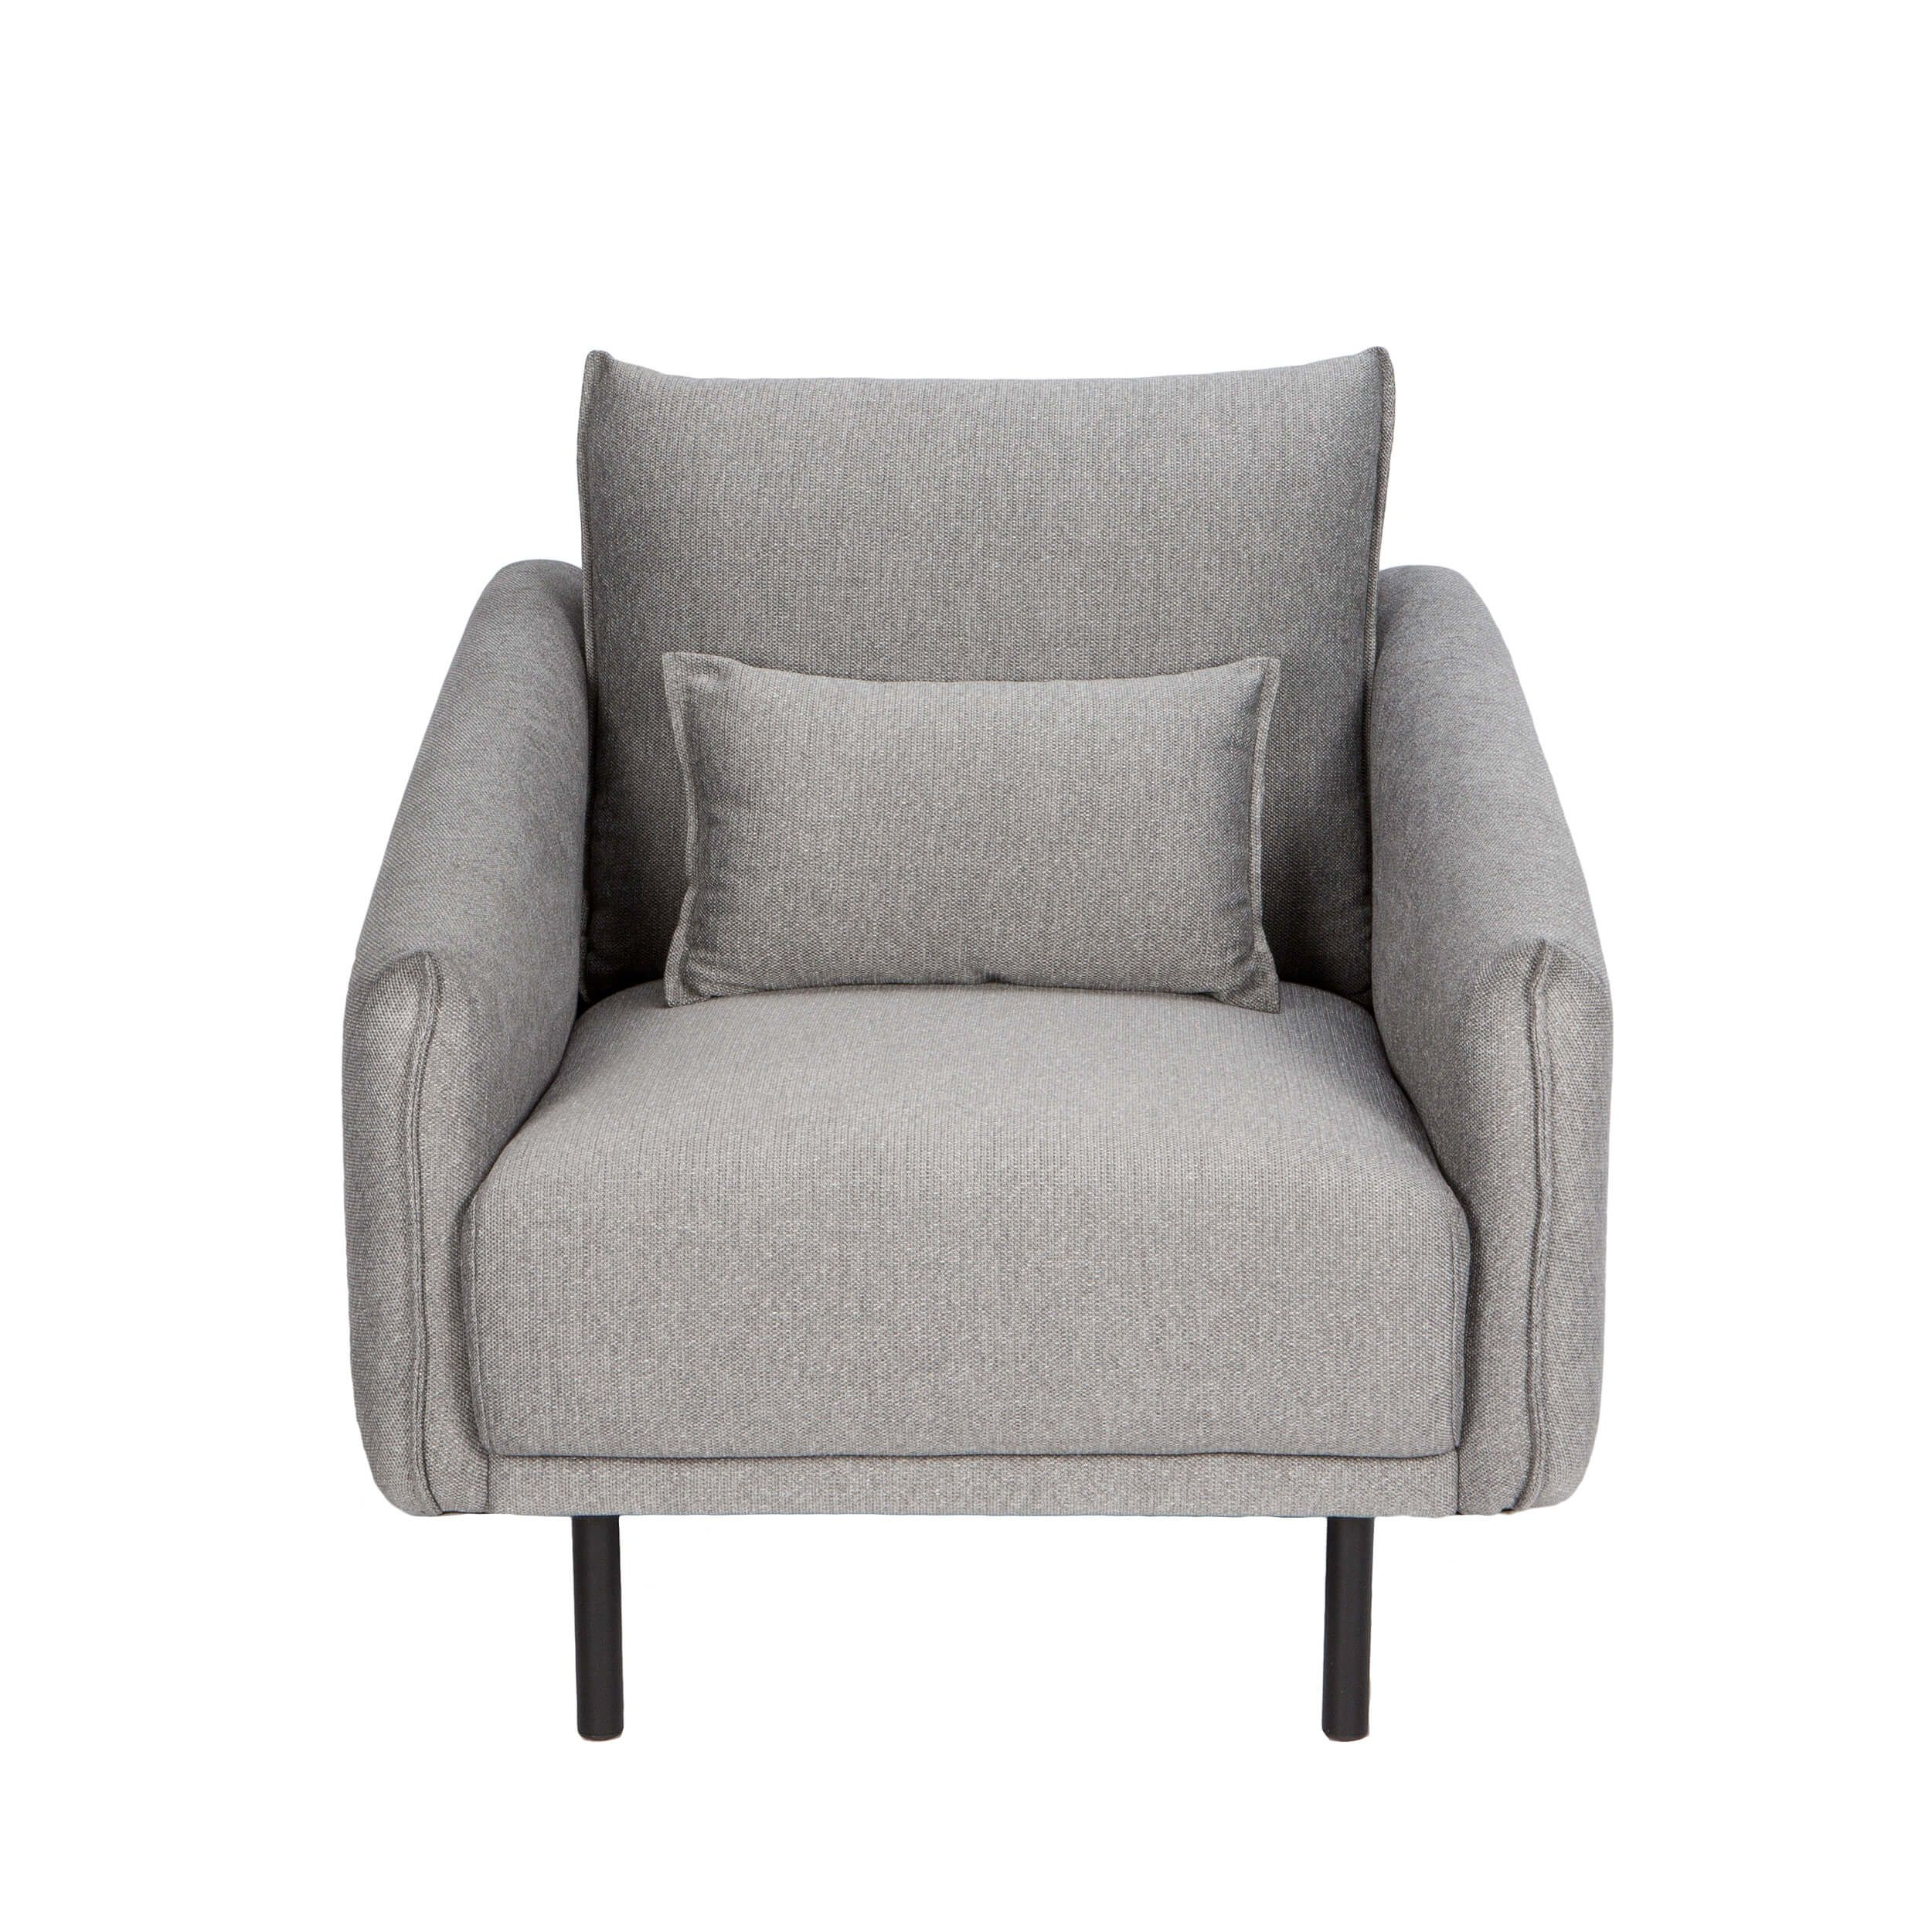 Stühle Creme Akzent Stuhl, Blau Samt Sessel Gelb Und Grau